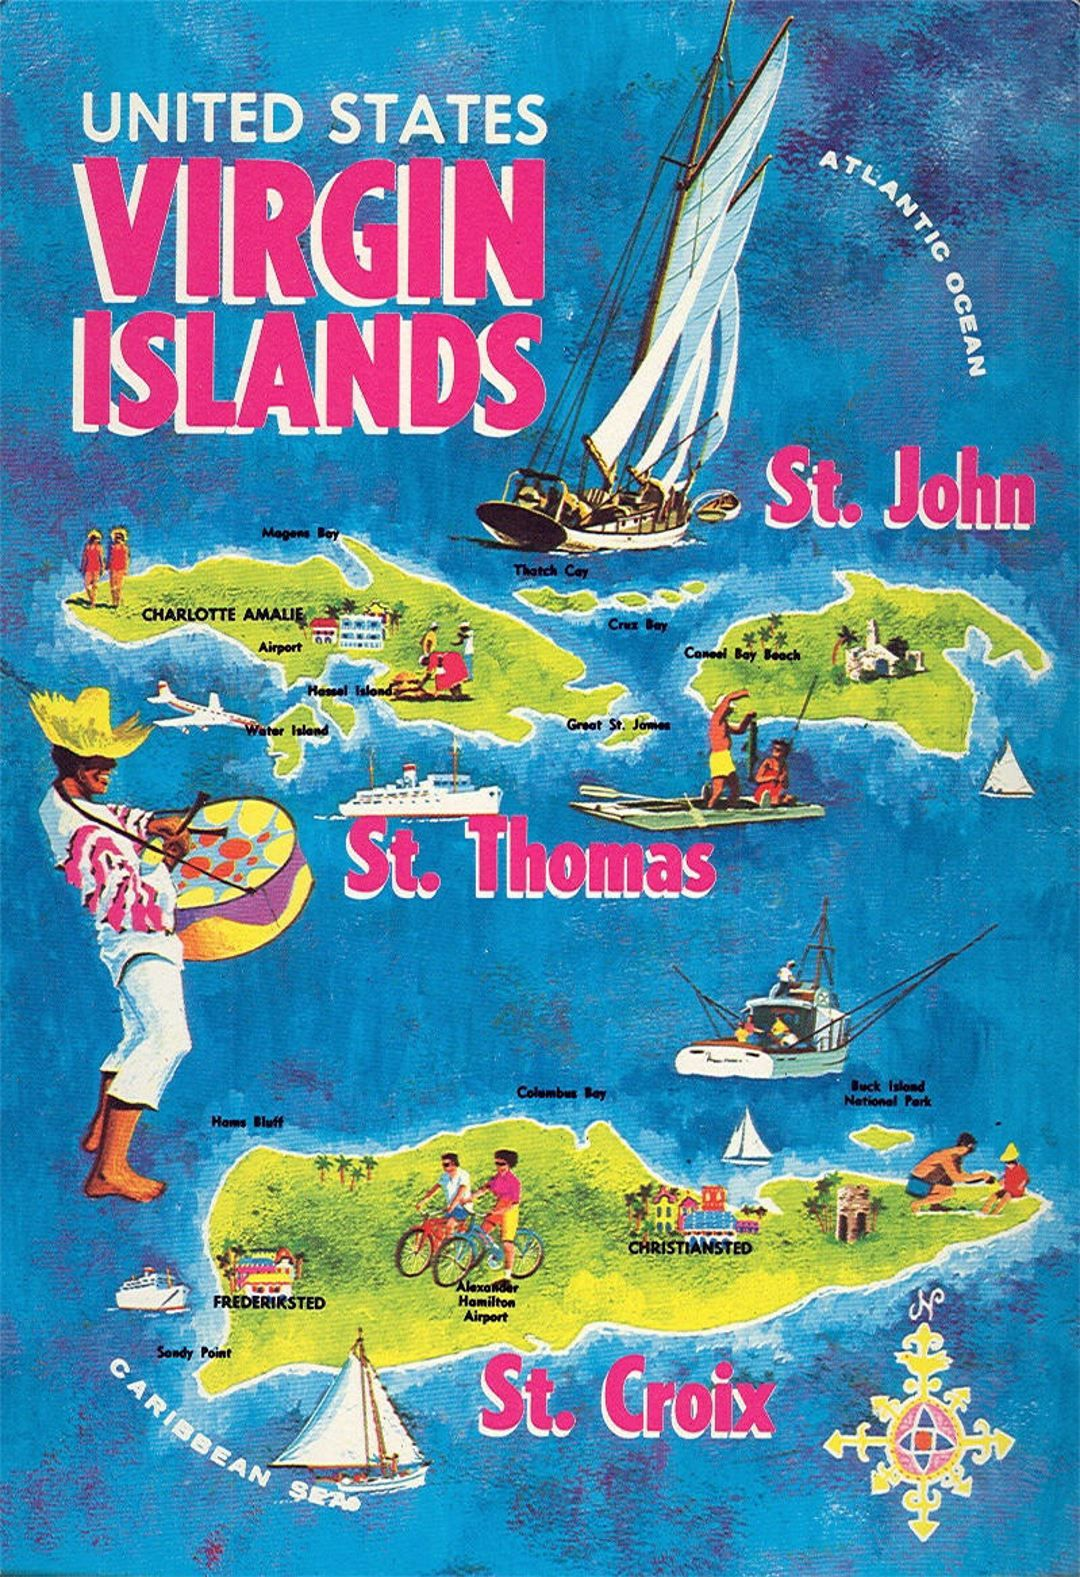 Virgin Islands  Caribbean  USVI  BVI  Diving   Vintage 1950/'s Style Travel Decal